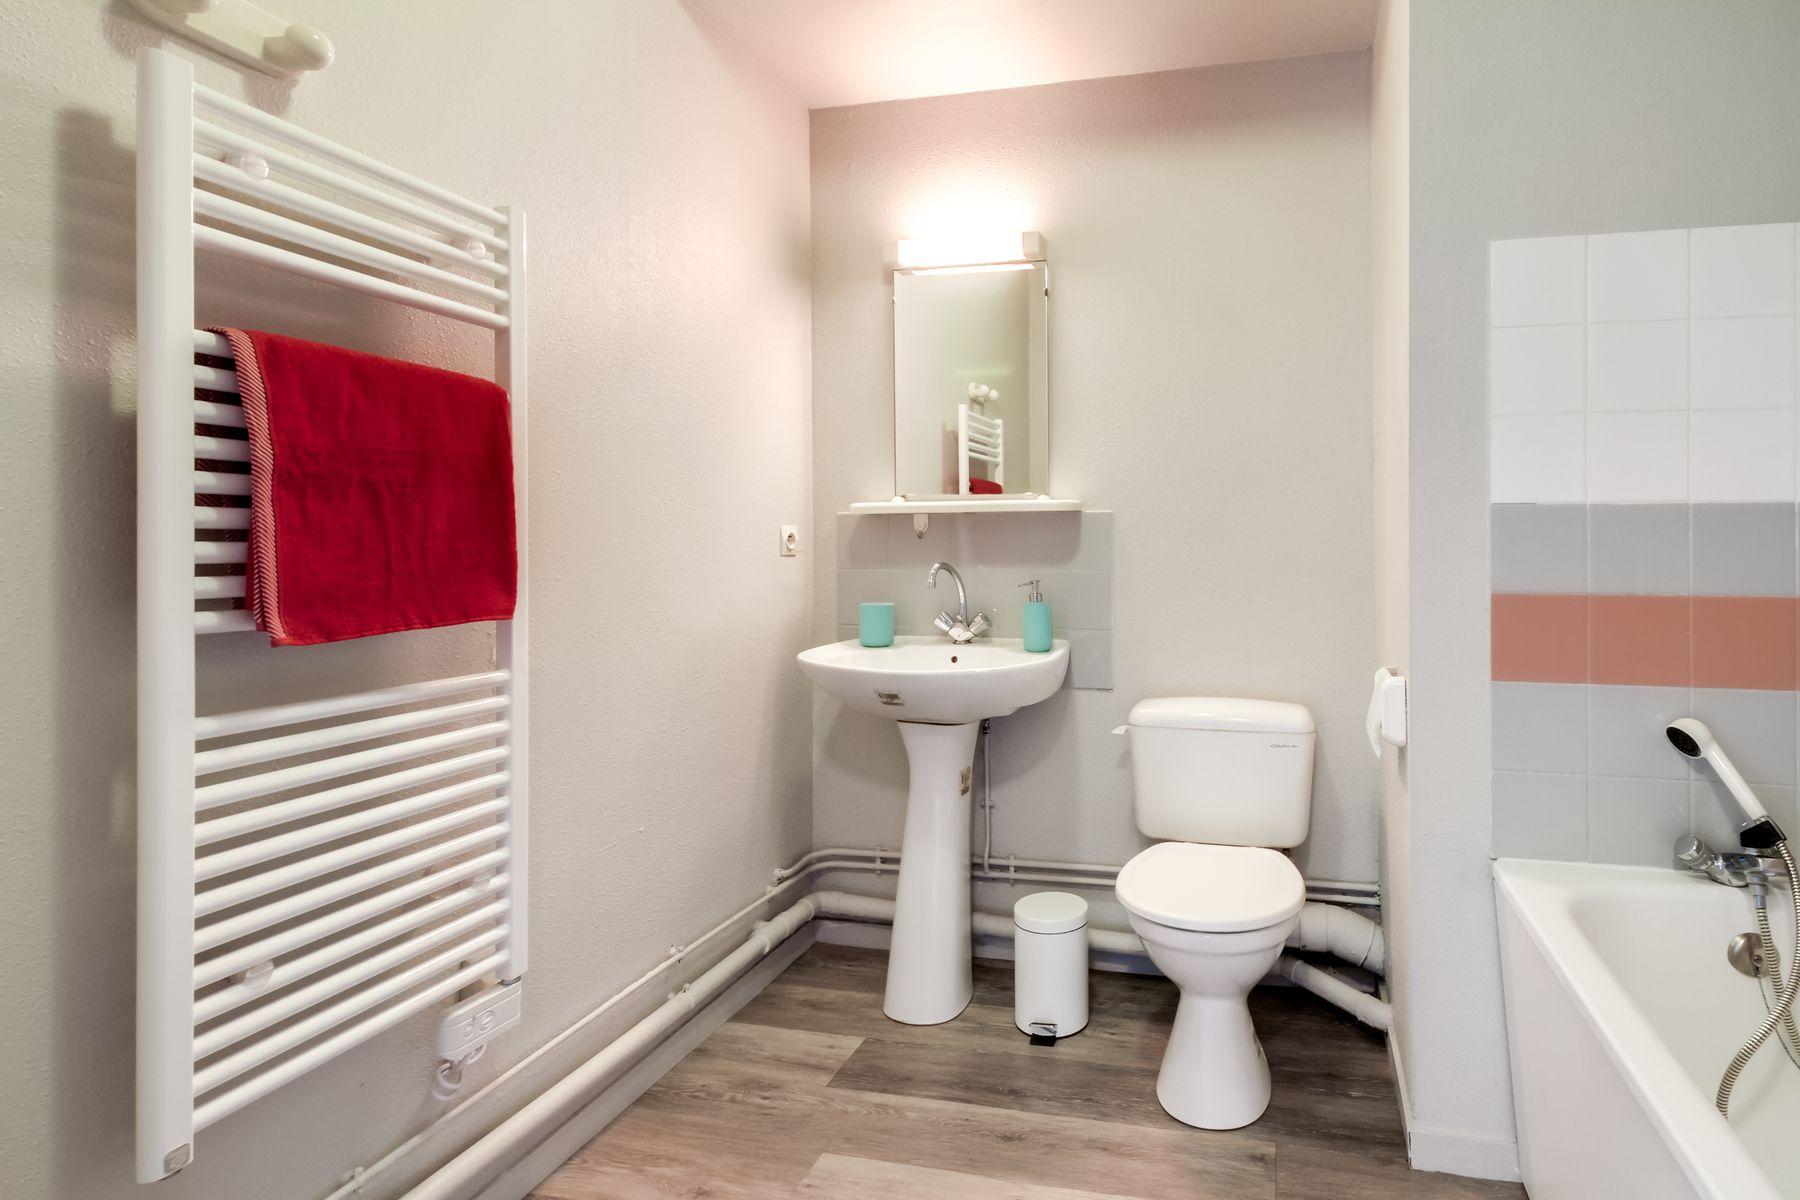 LOGIFAC résidence étudiante Saint-Exupéry Dijon salle de bain